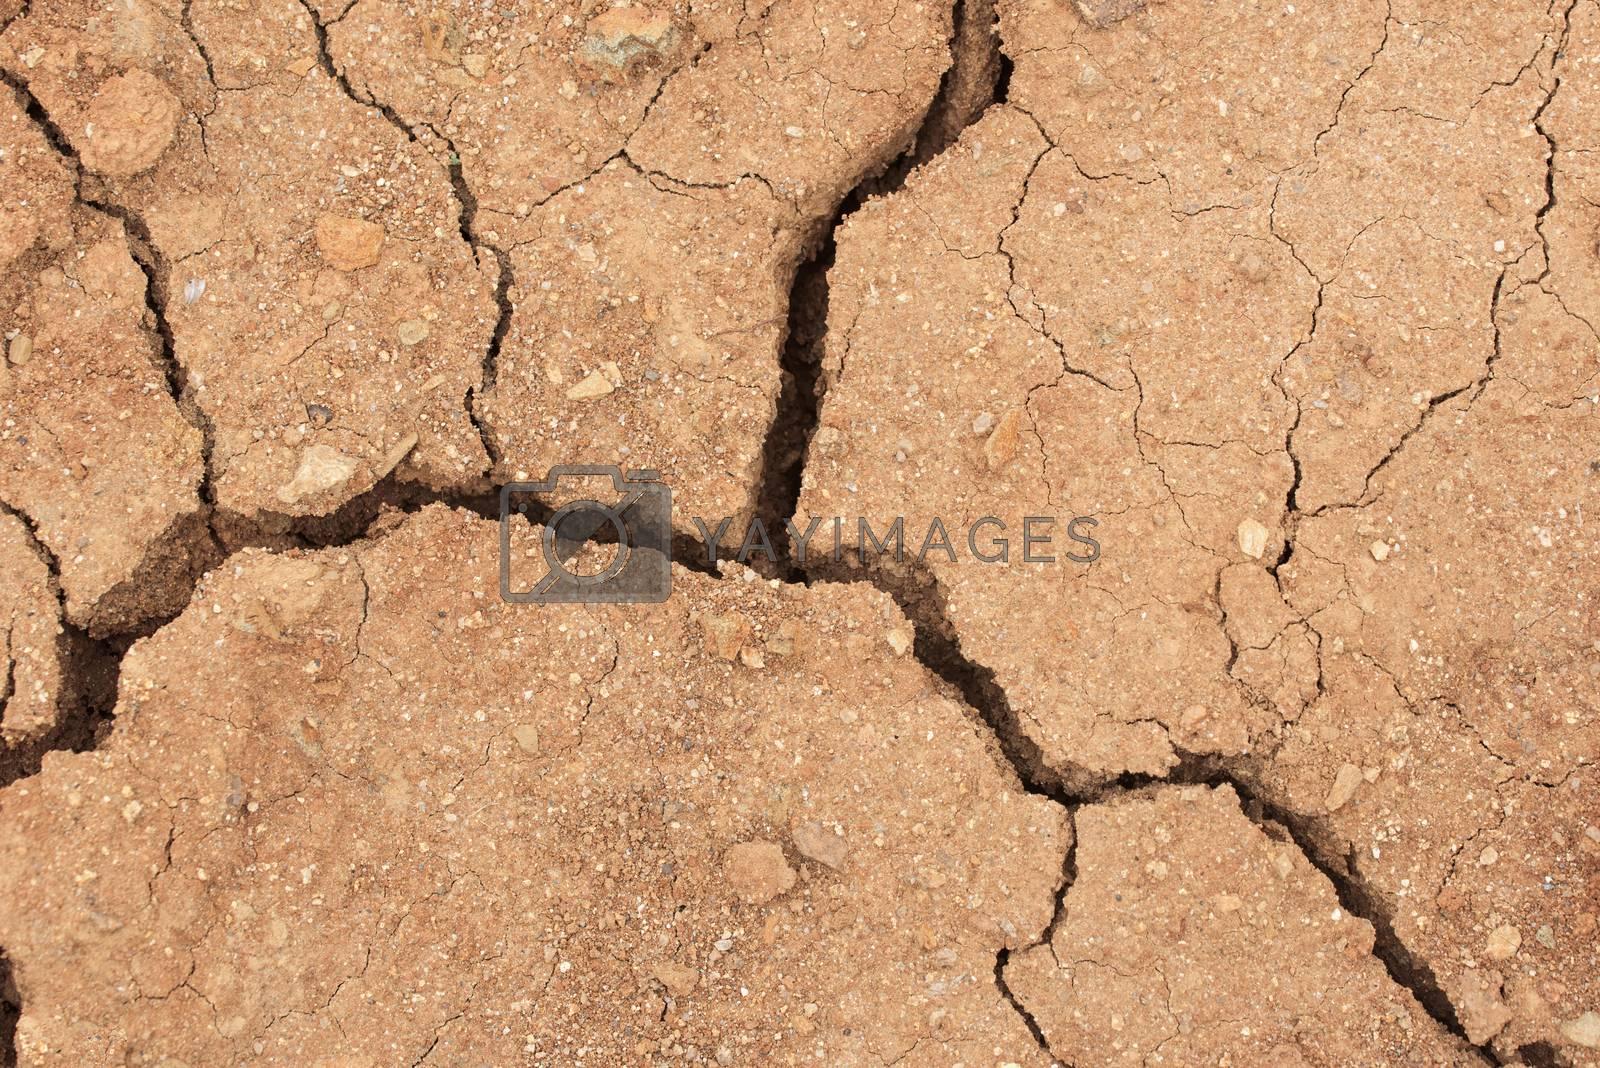 Dry land with cracks. Cracked earth in dry desert